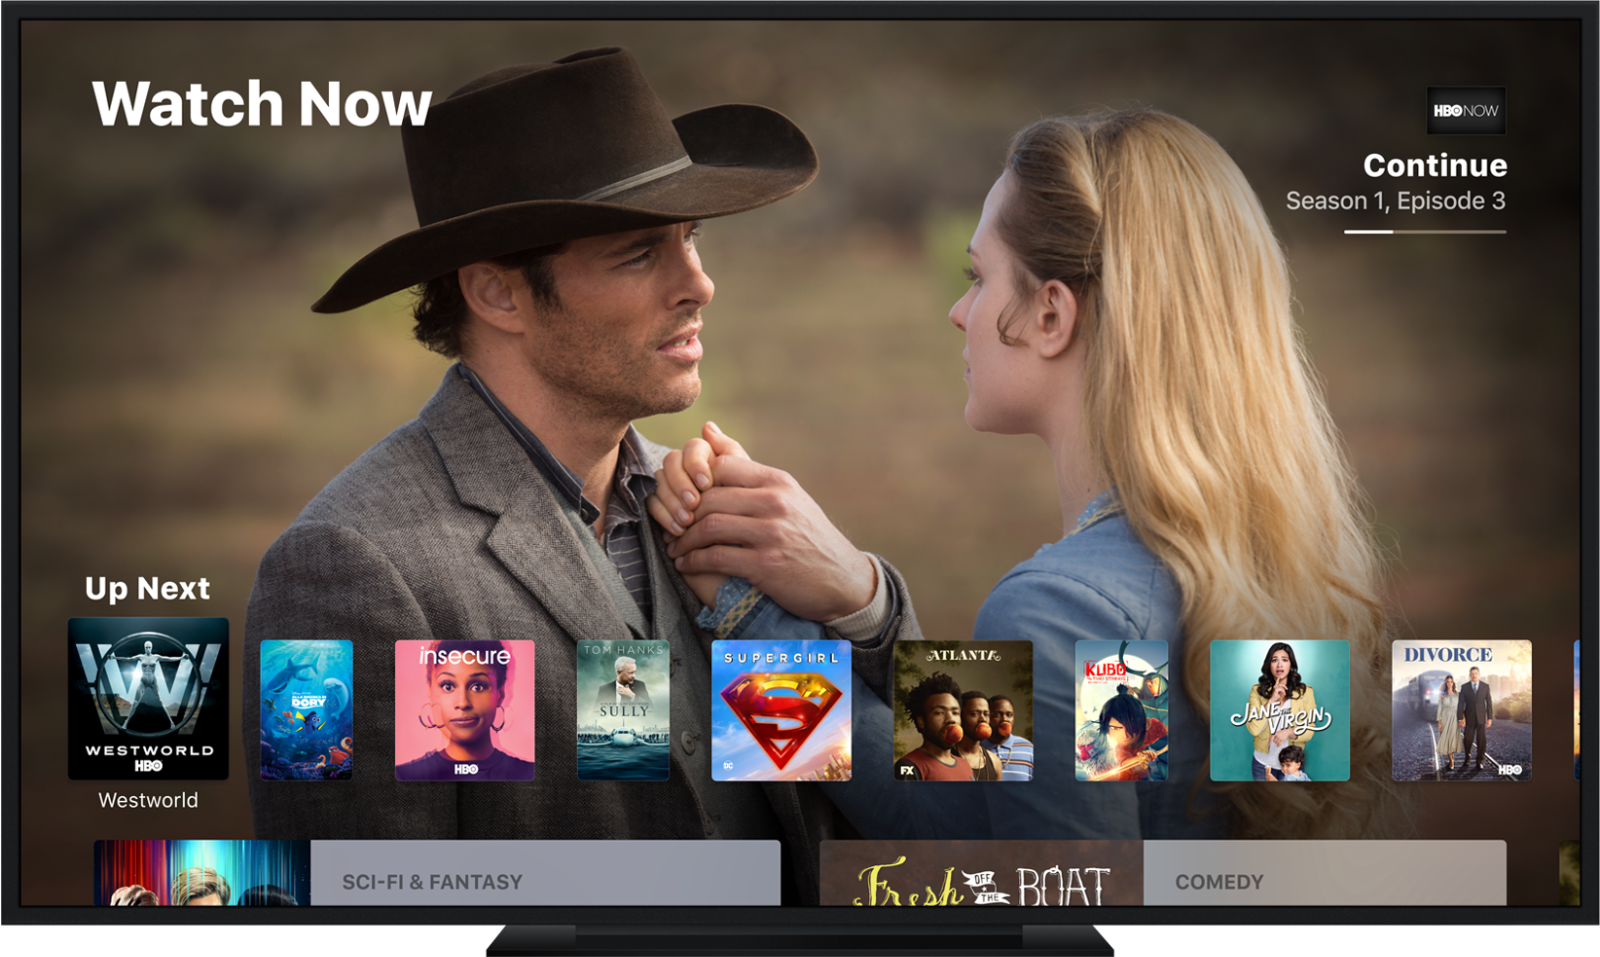 Apple TV 国内观看 Netflix/HBO